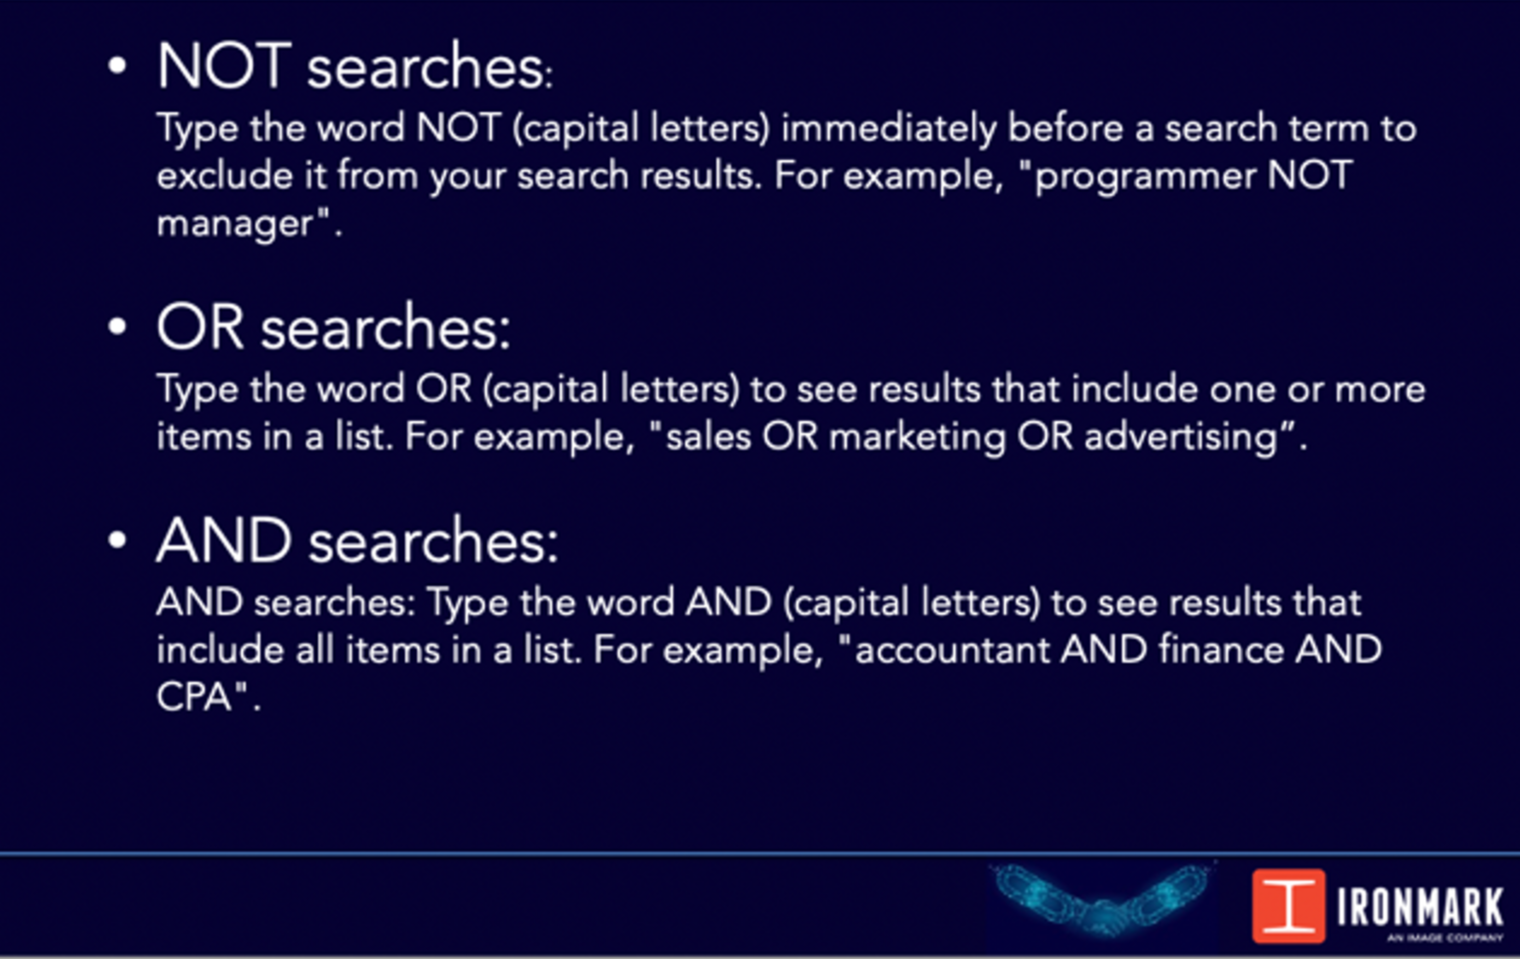 LinkedIn People Search Training | Ironmark - An Image Company